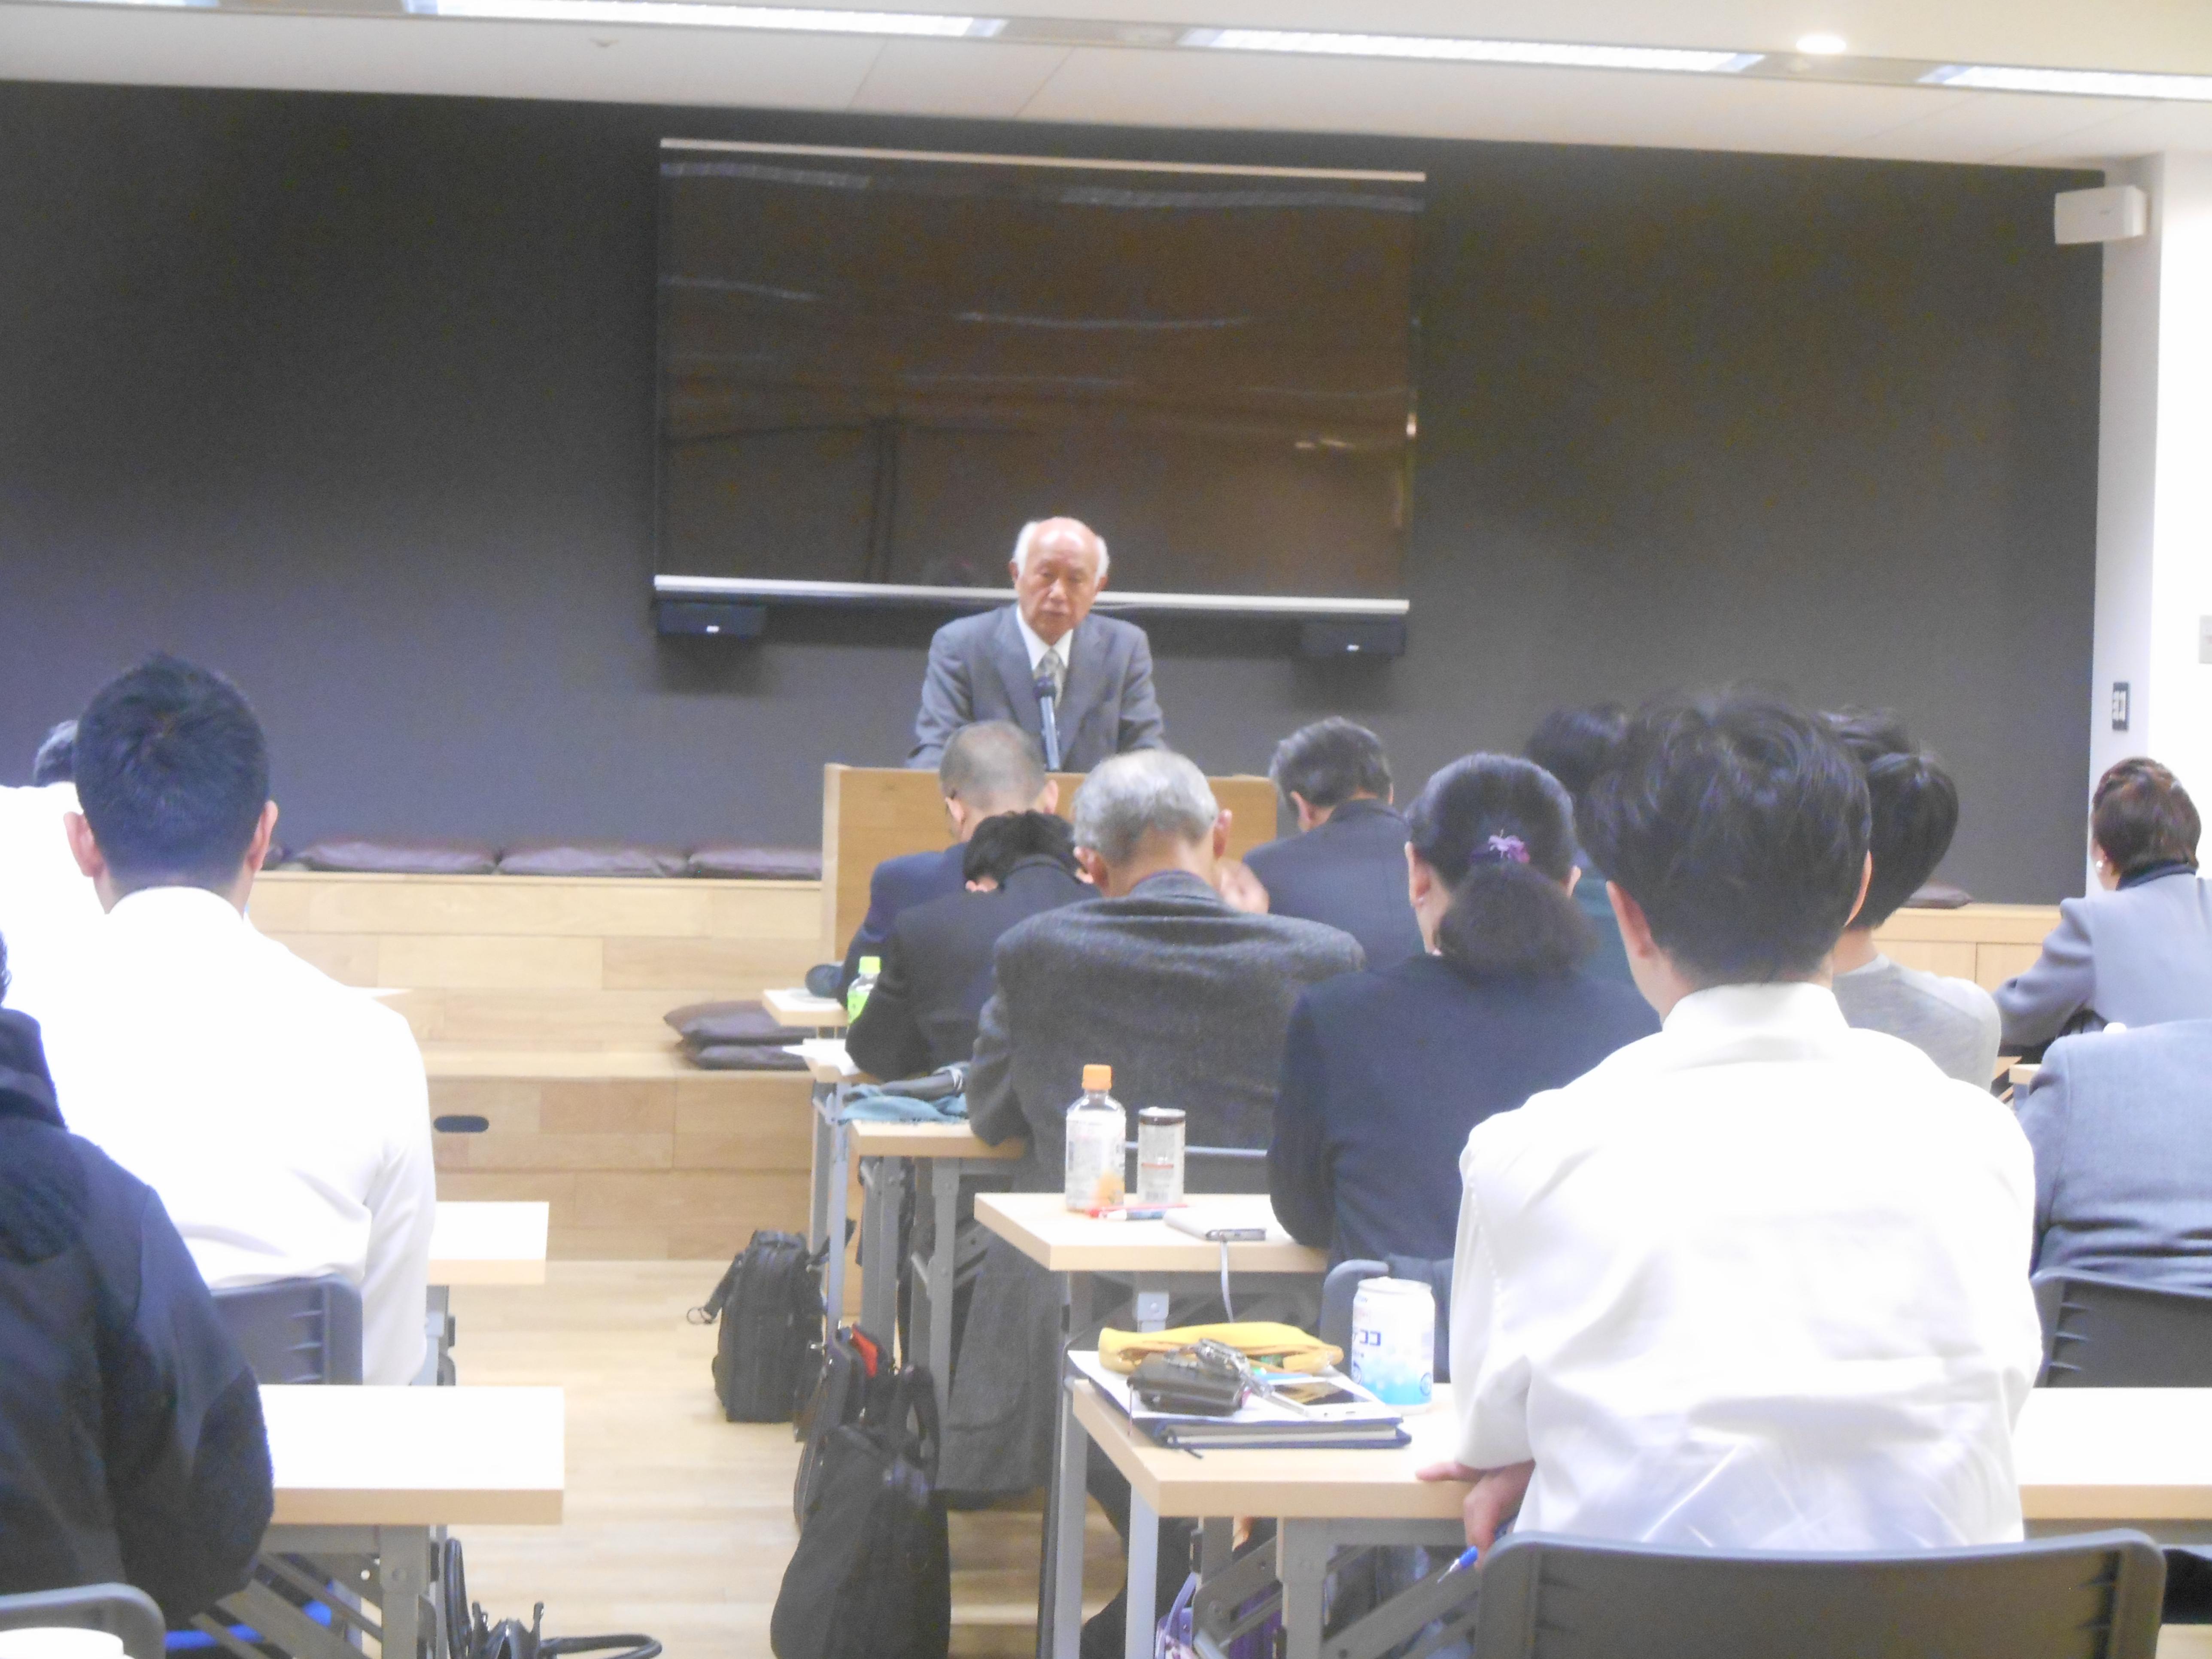 DSCN2308 - 4月1日東京思風塾の開催になります。